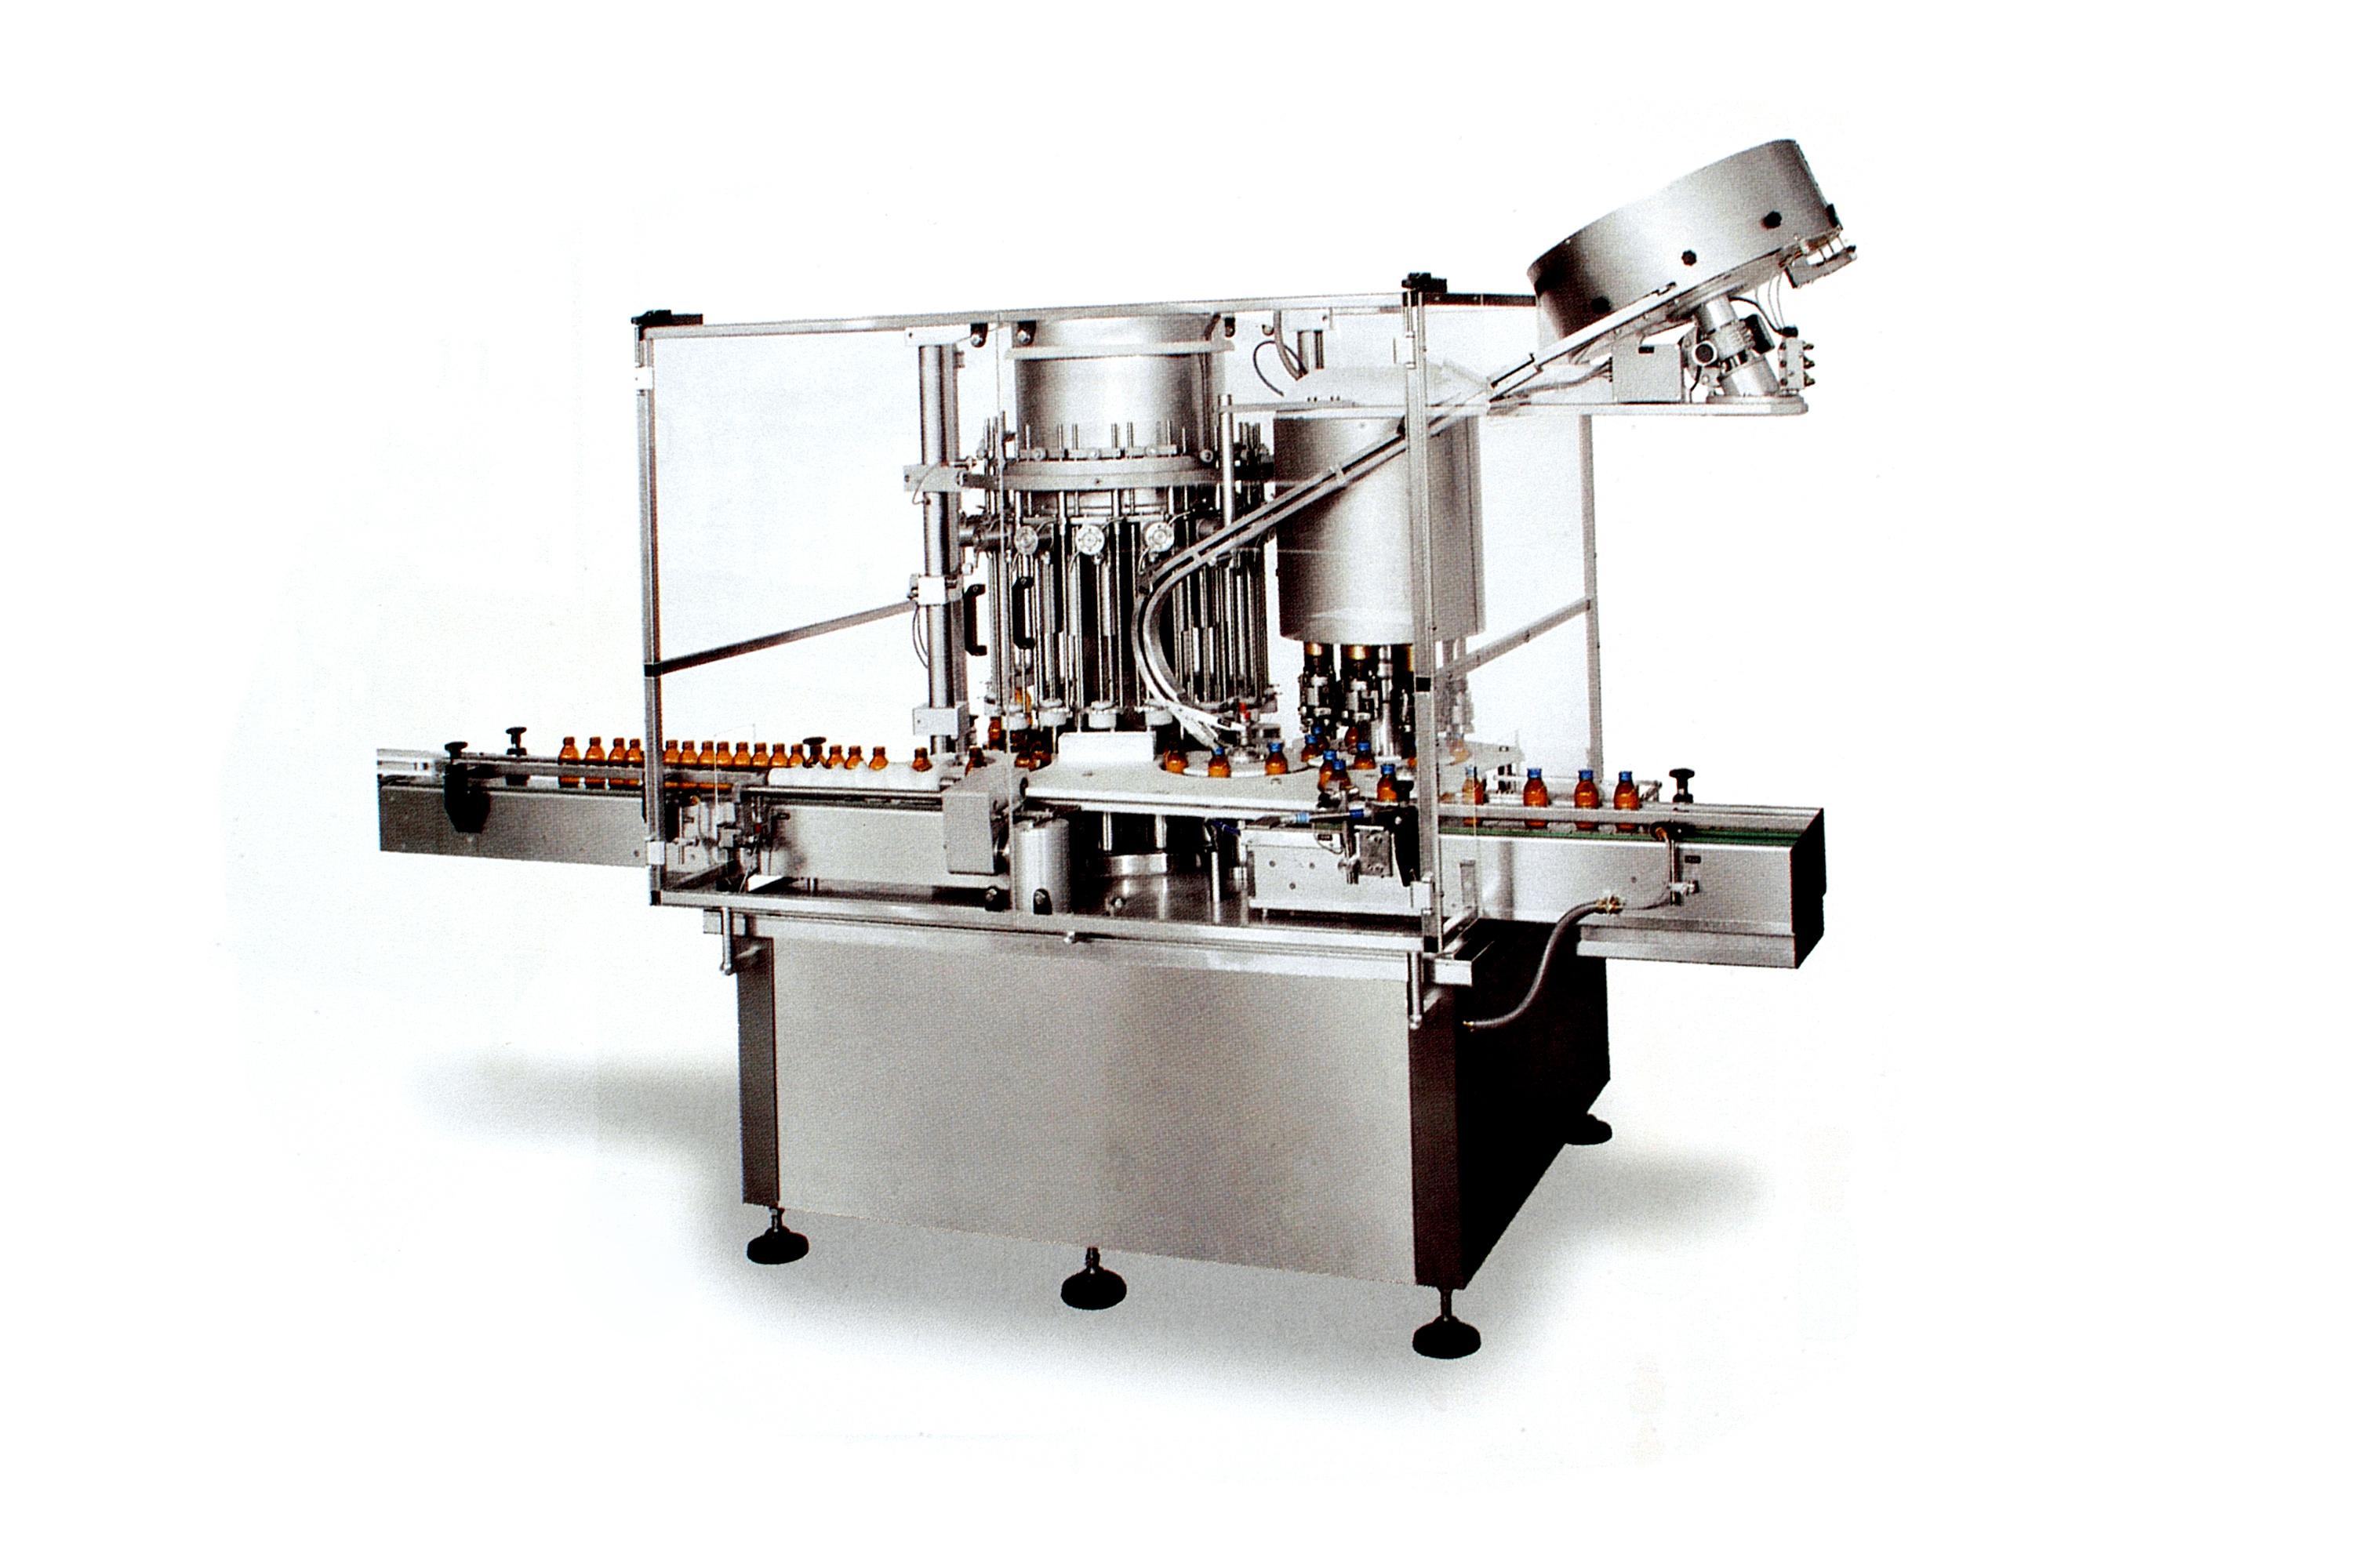 campak-envasadoras-de-liquidos-L112-01